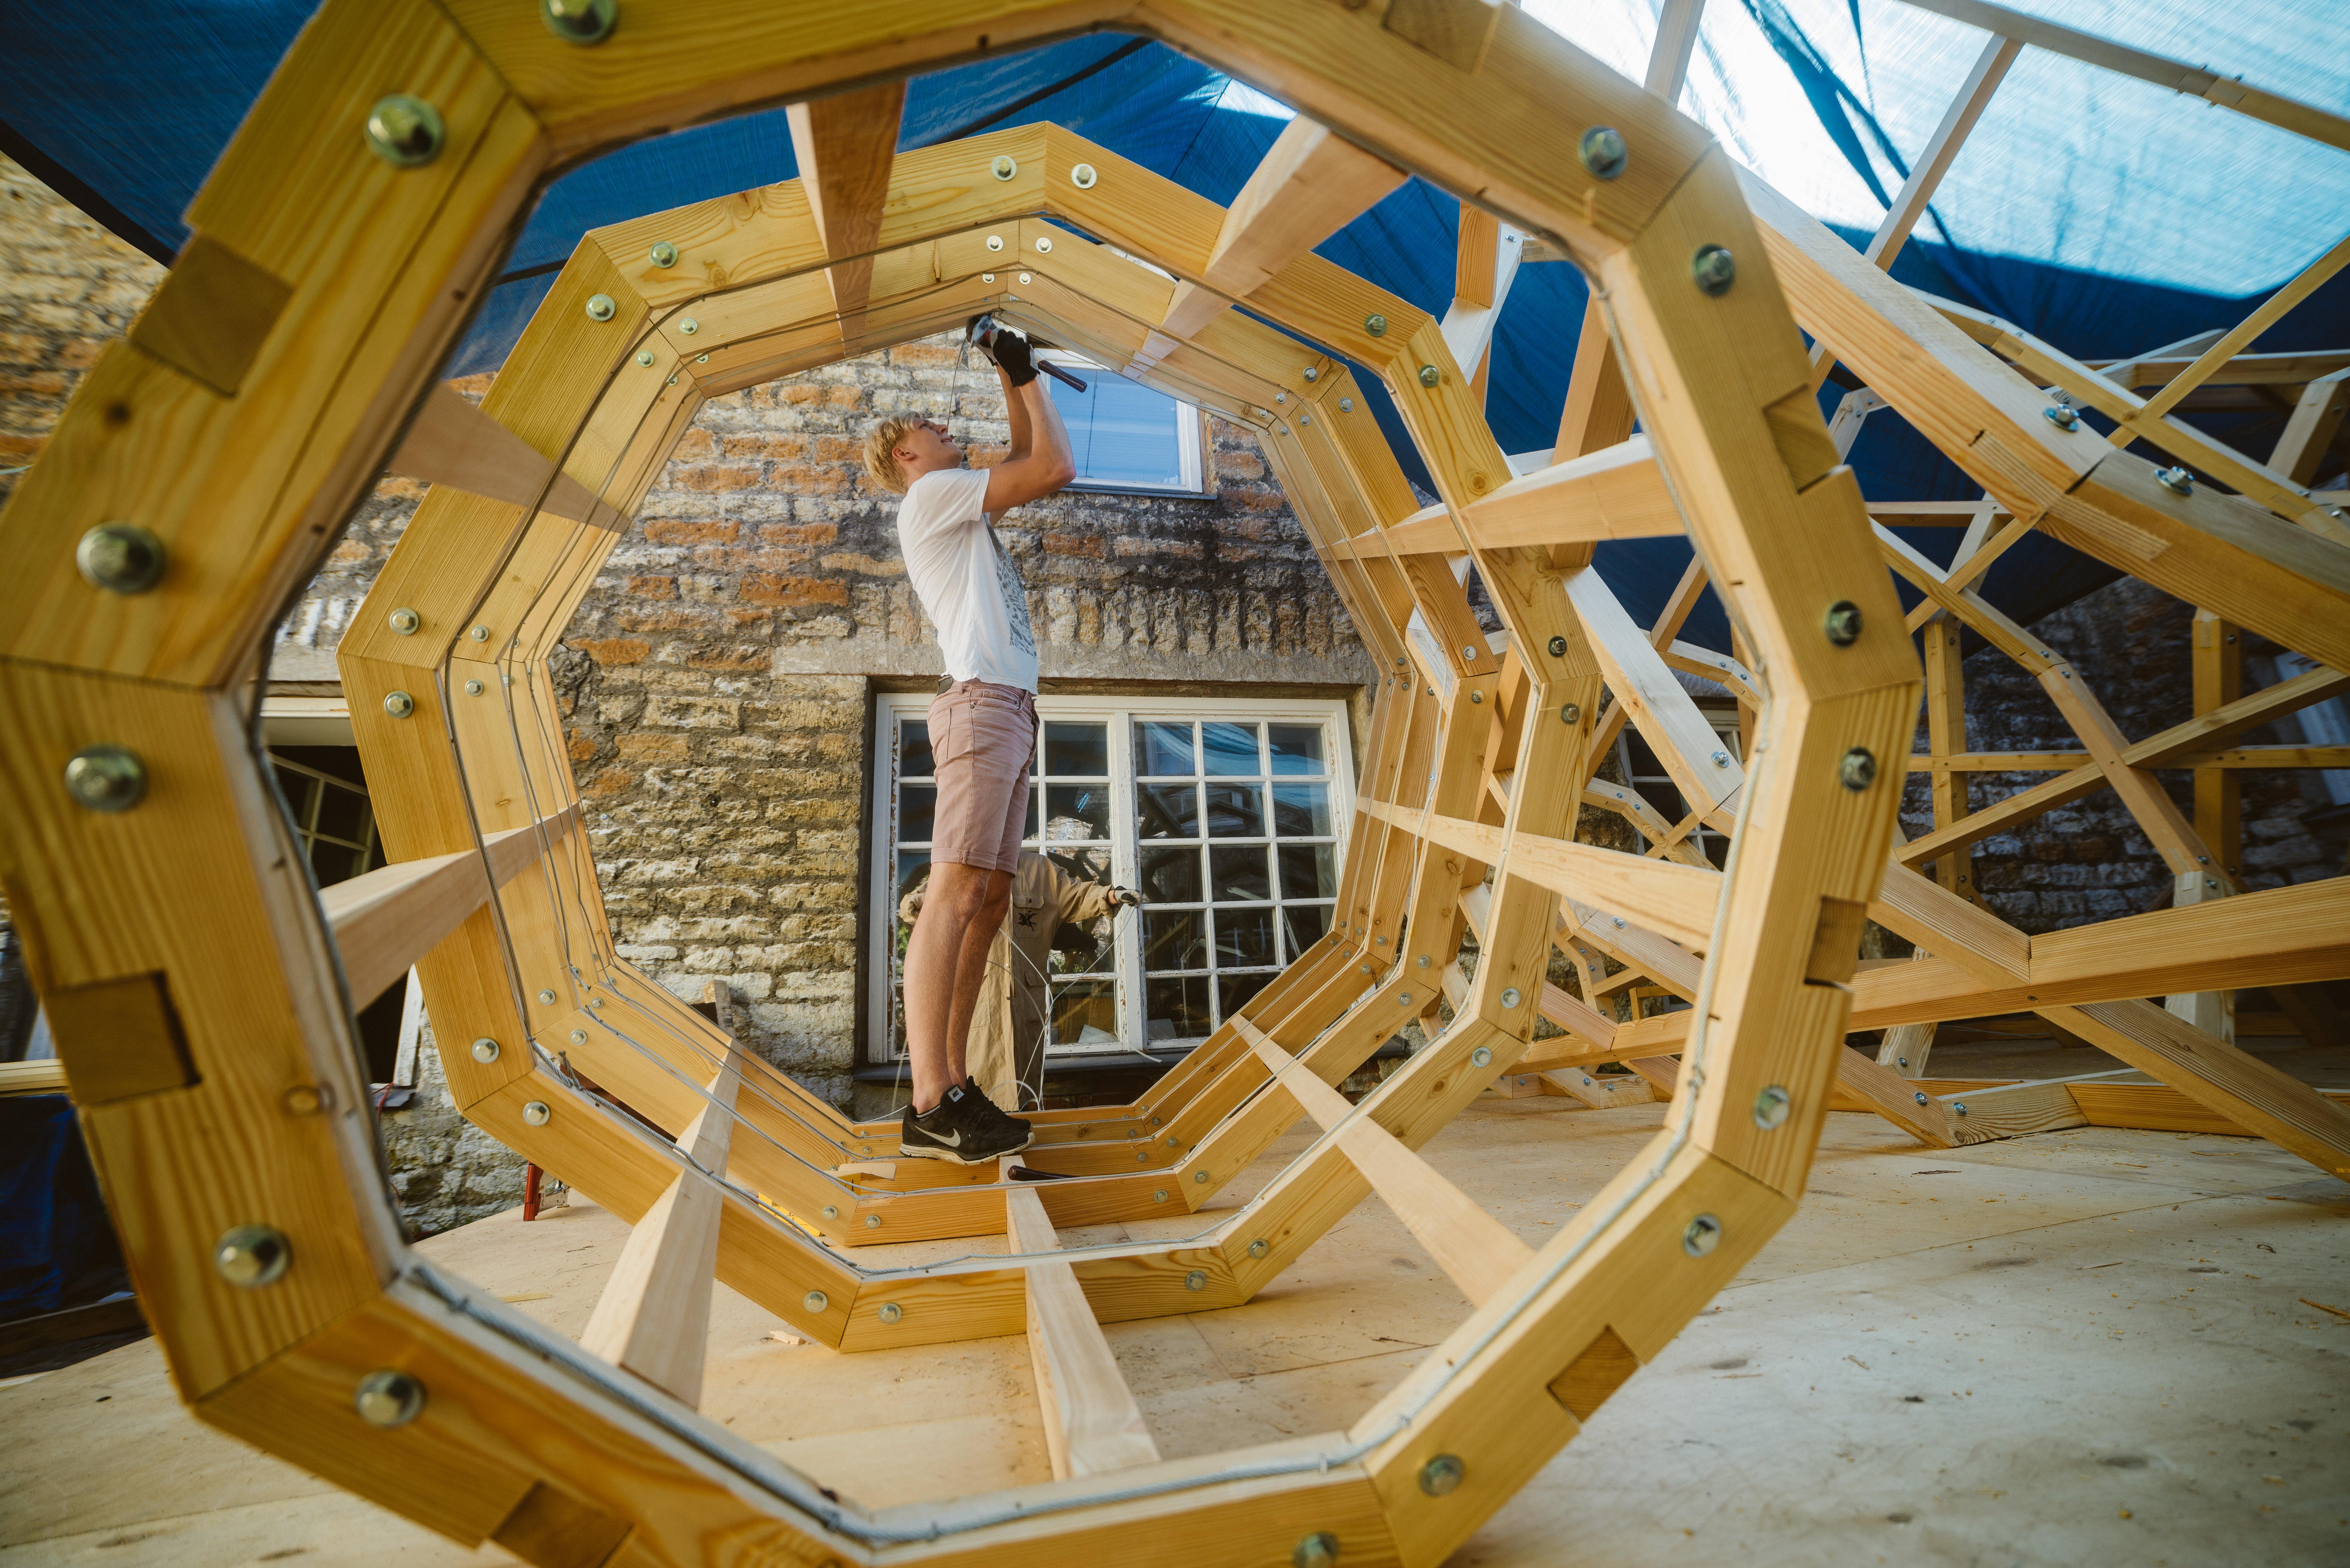 Interior architecture students capture the sound of the Estonian